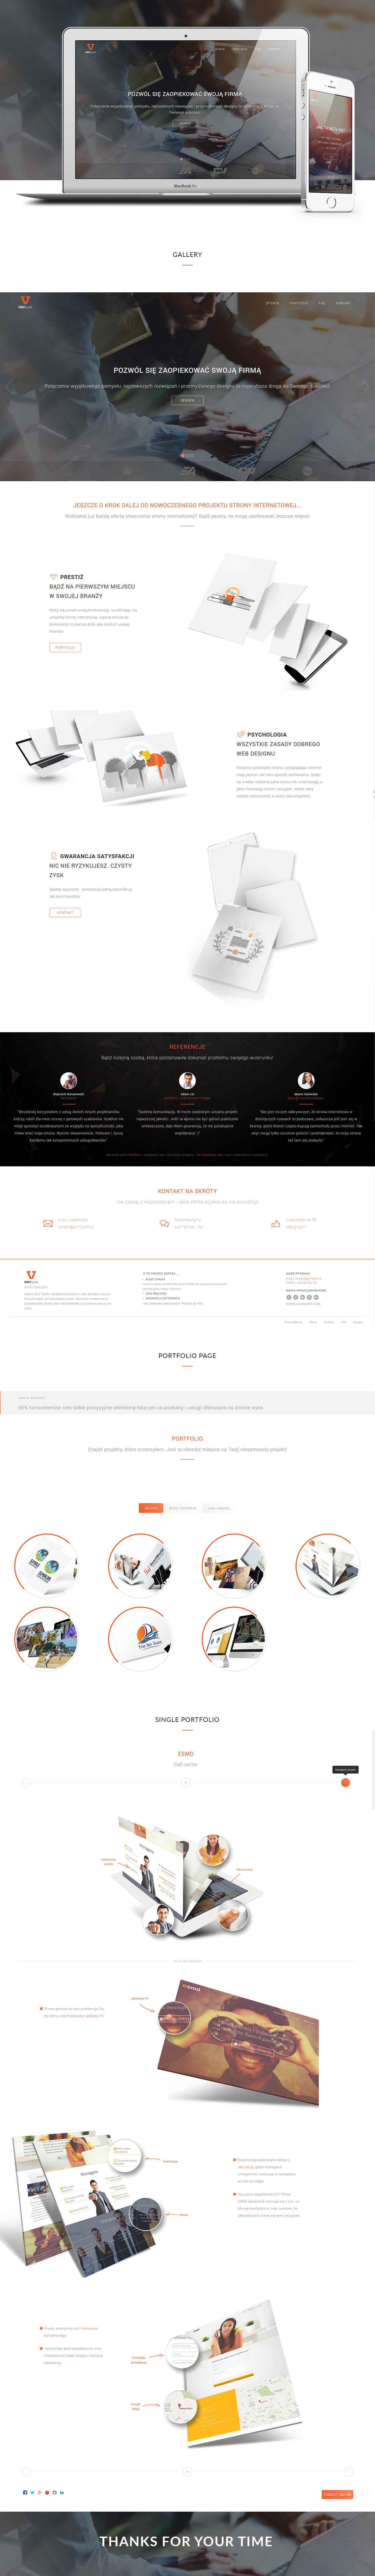 Webdesign portfolio modern clean showcase gm7 grafik design Website www Project